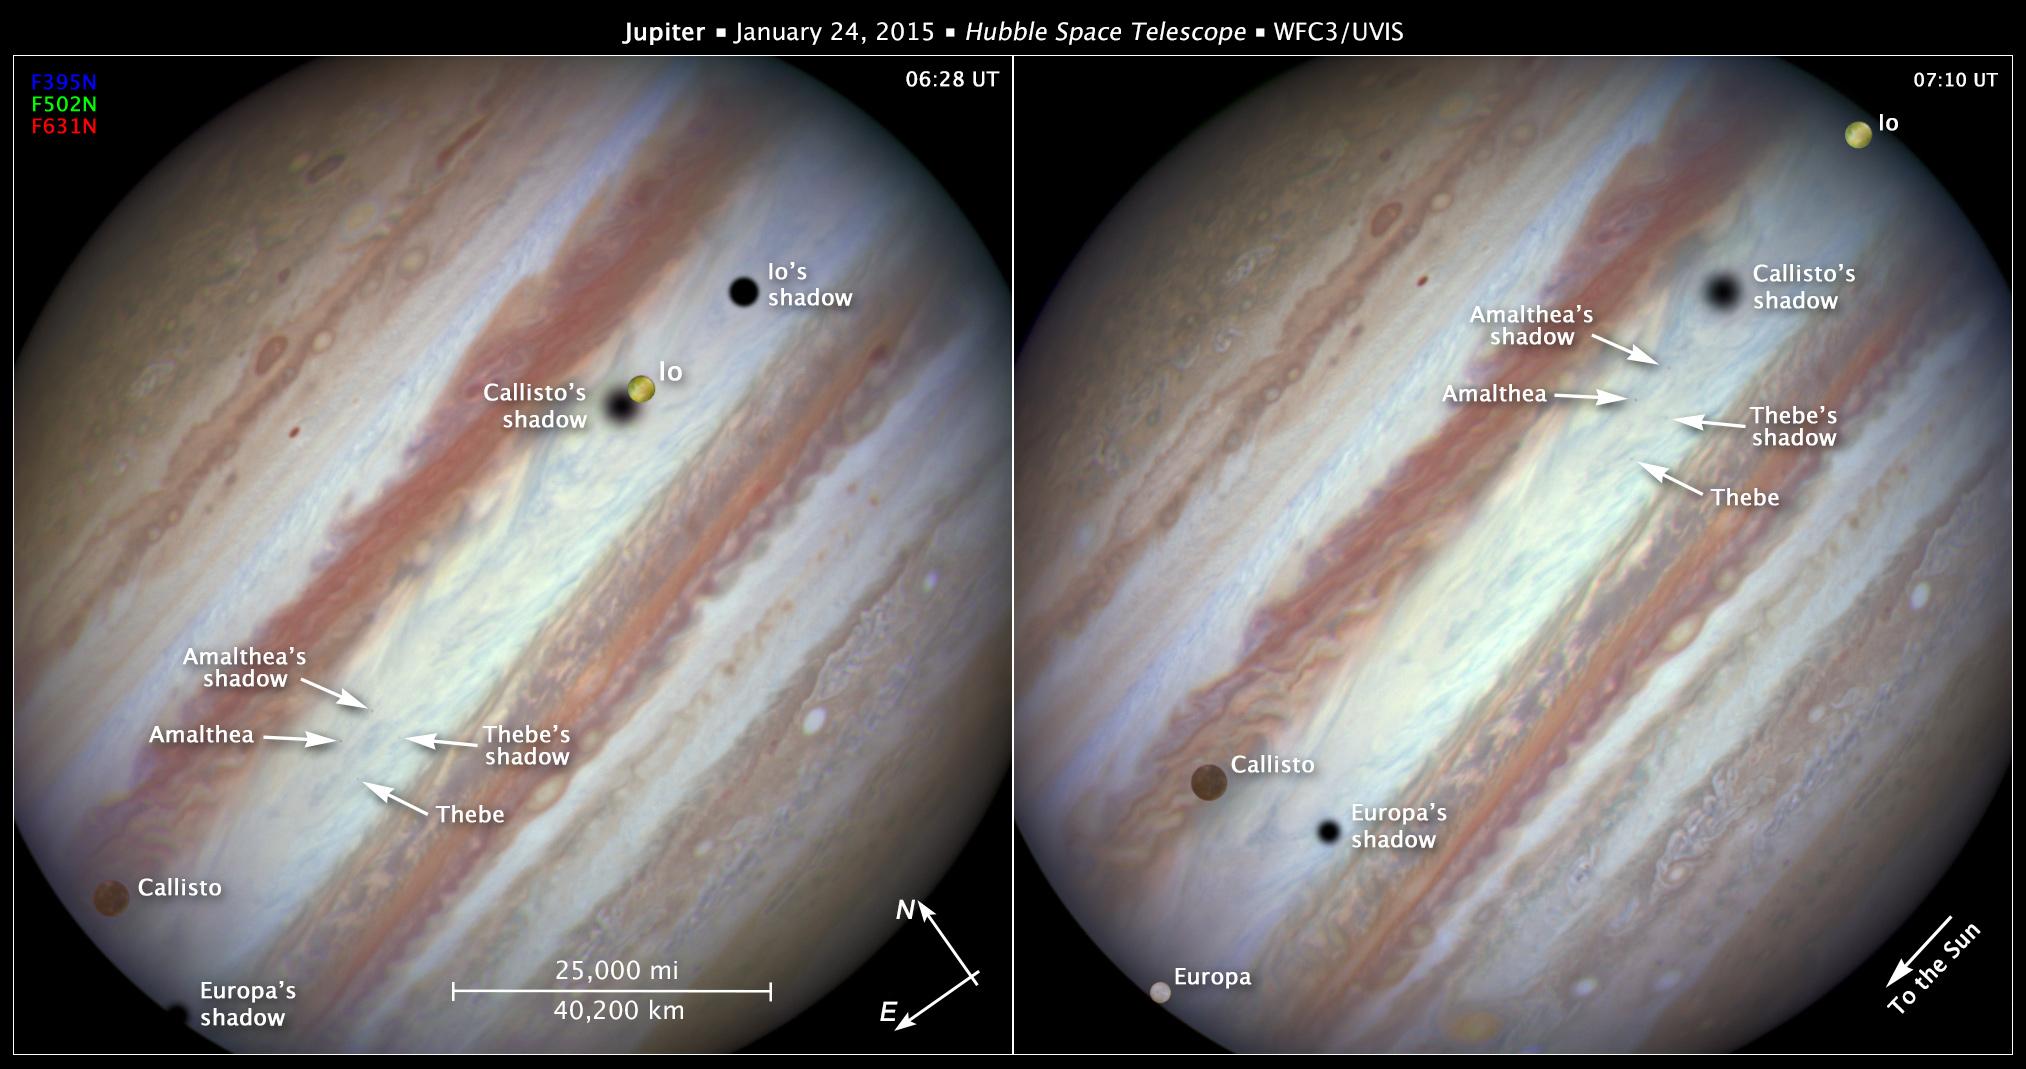 jupiter moon thebe - photo #23